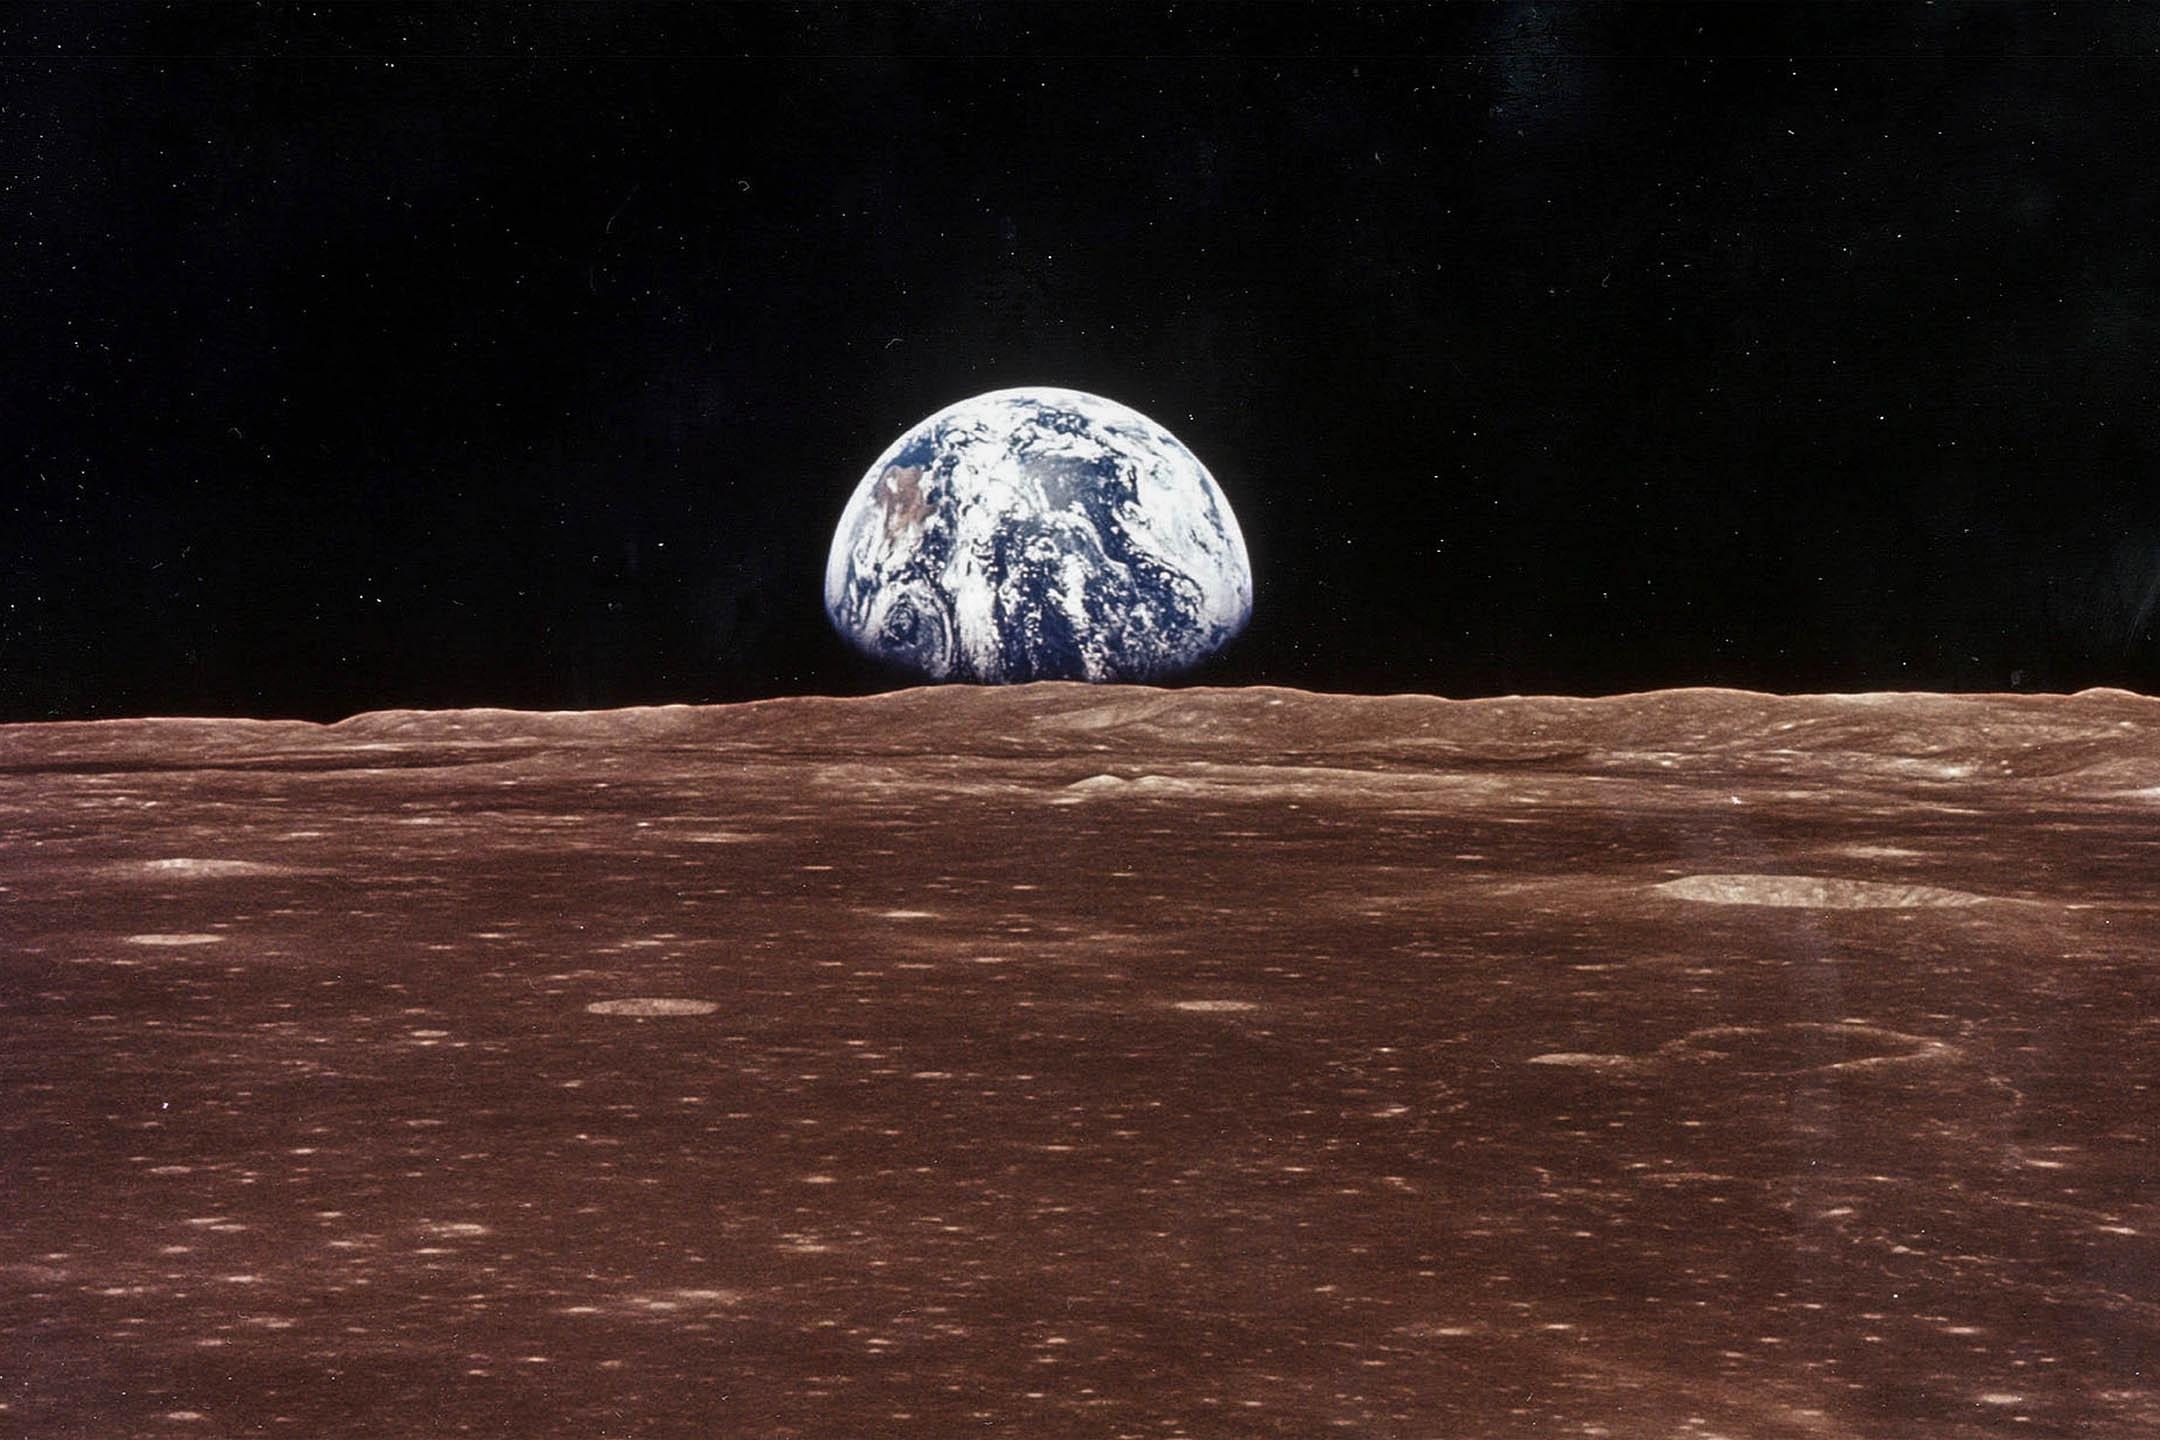 NASA已於2018年底正式啟動商業月球運載服務(CLPS),這是特朗普政府SPD-1鼓勵商業發展的要旨。  圖 : NASA via Getty Images